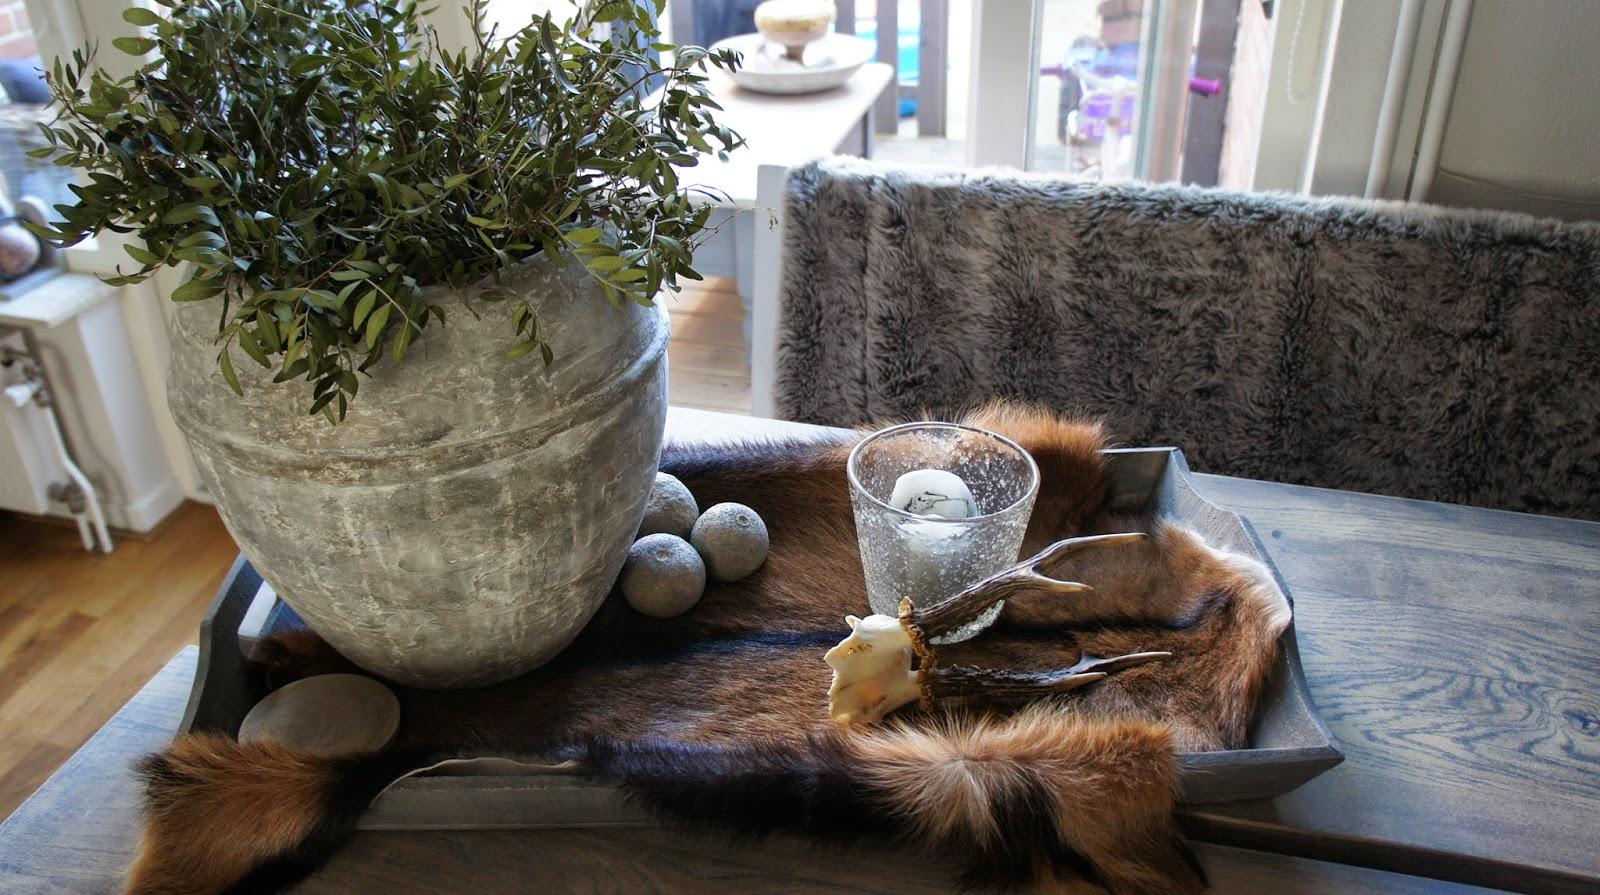 Wonen a la mar september 2014 - Decoratie tafel eetkamer ...